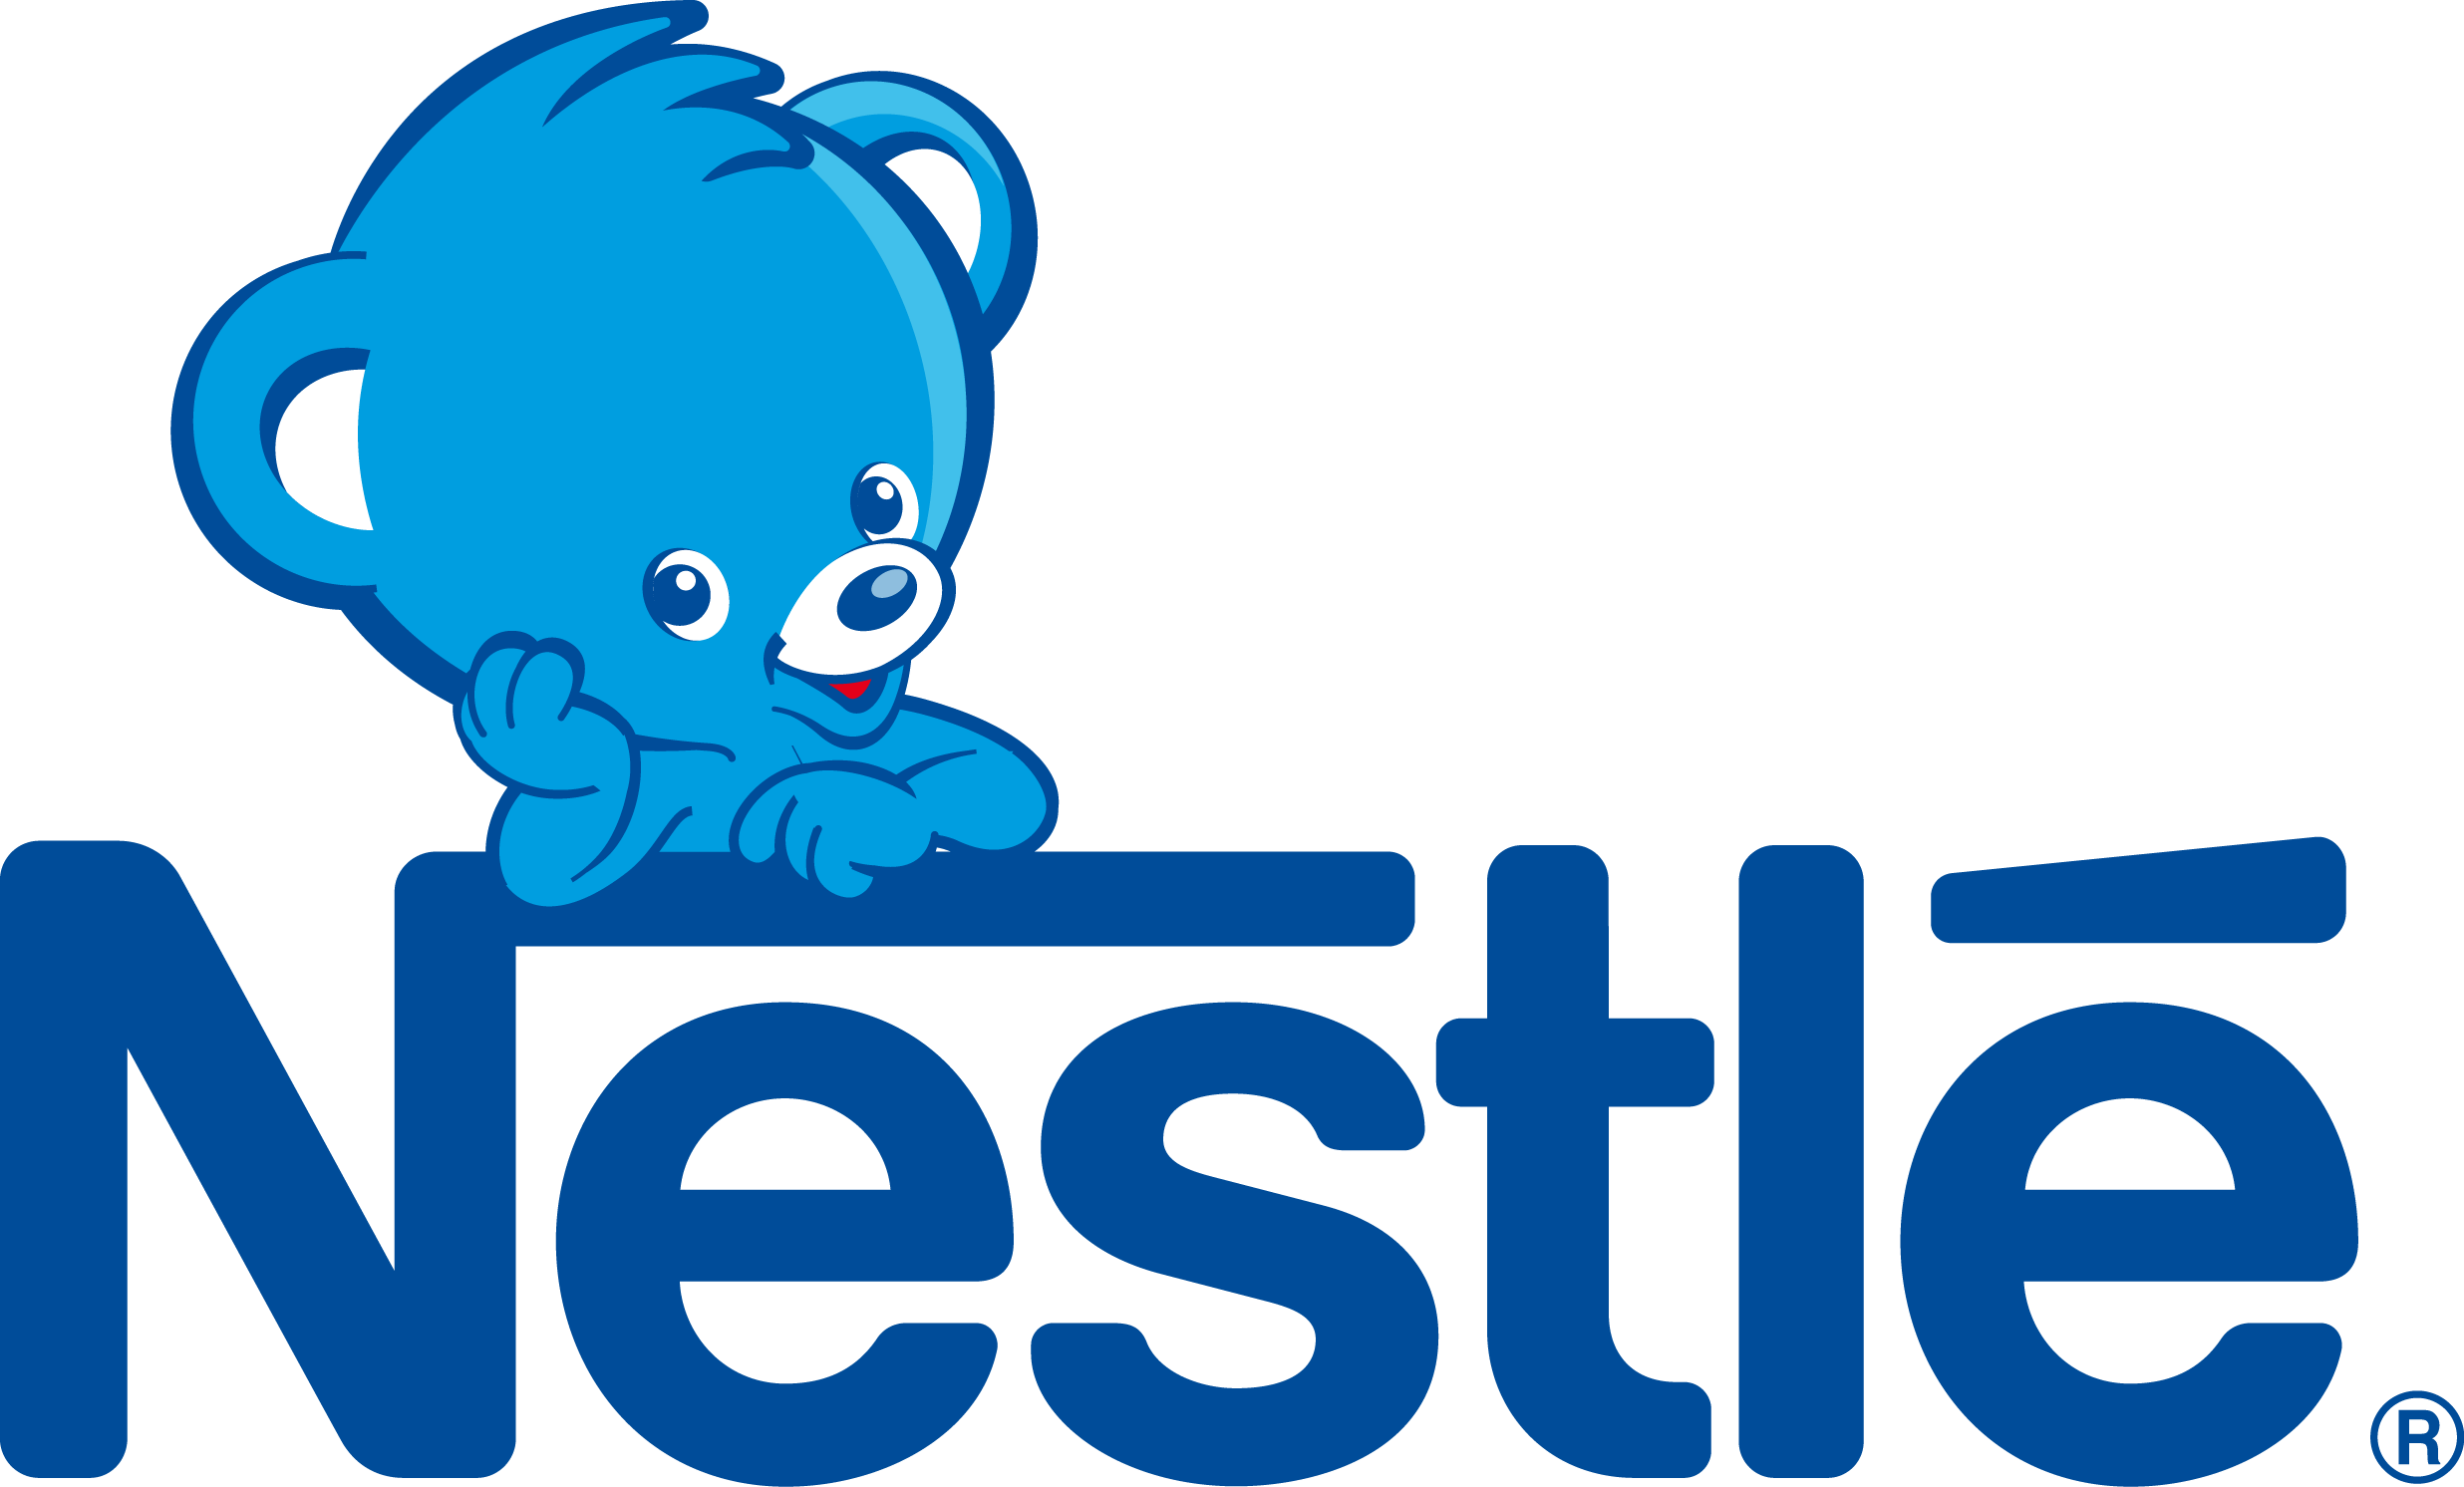 Png 2472X1492 Nestle Logo Background - Nestle, Transparent background PNG HD thumbnail